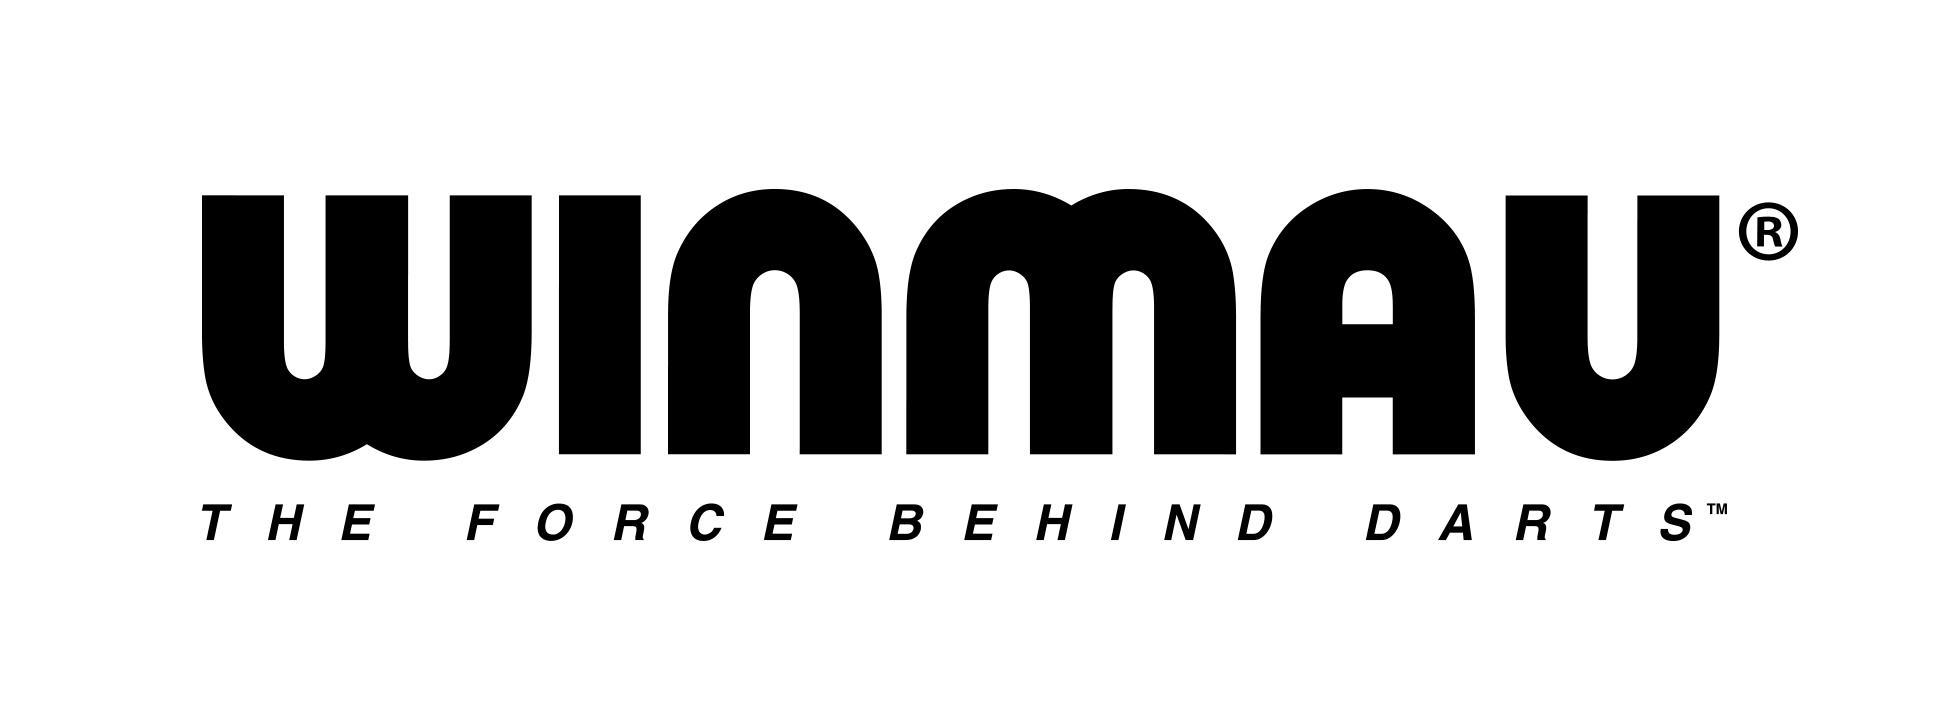 winmau-logo---black-text-with-white-backgrounf.jpg